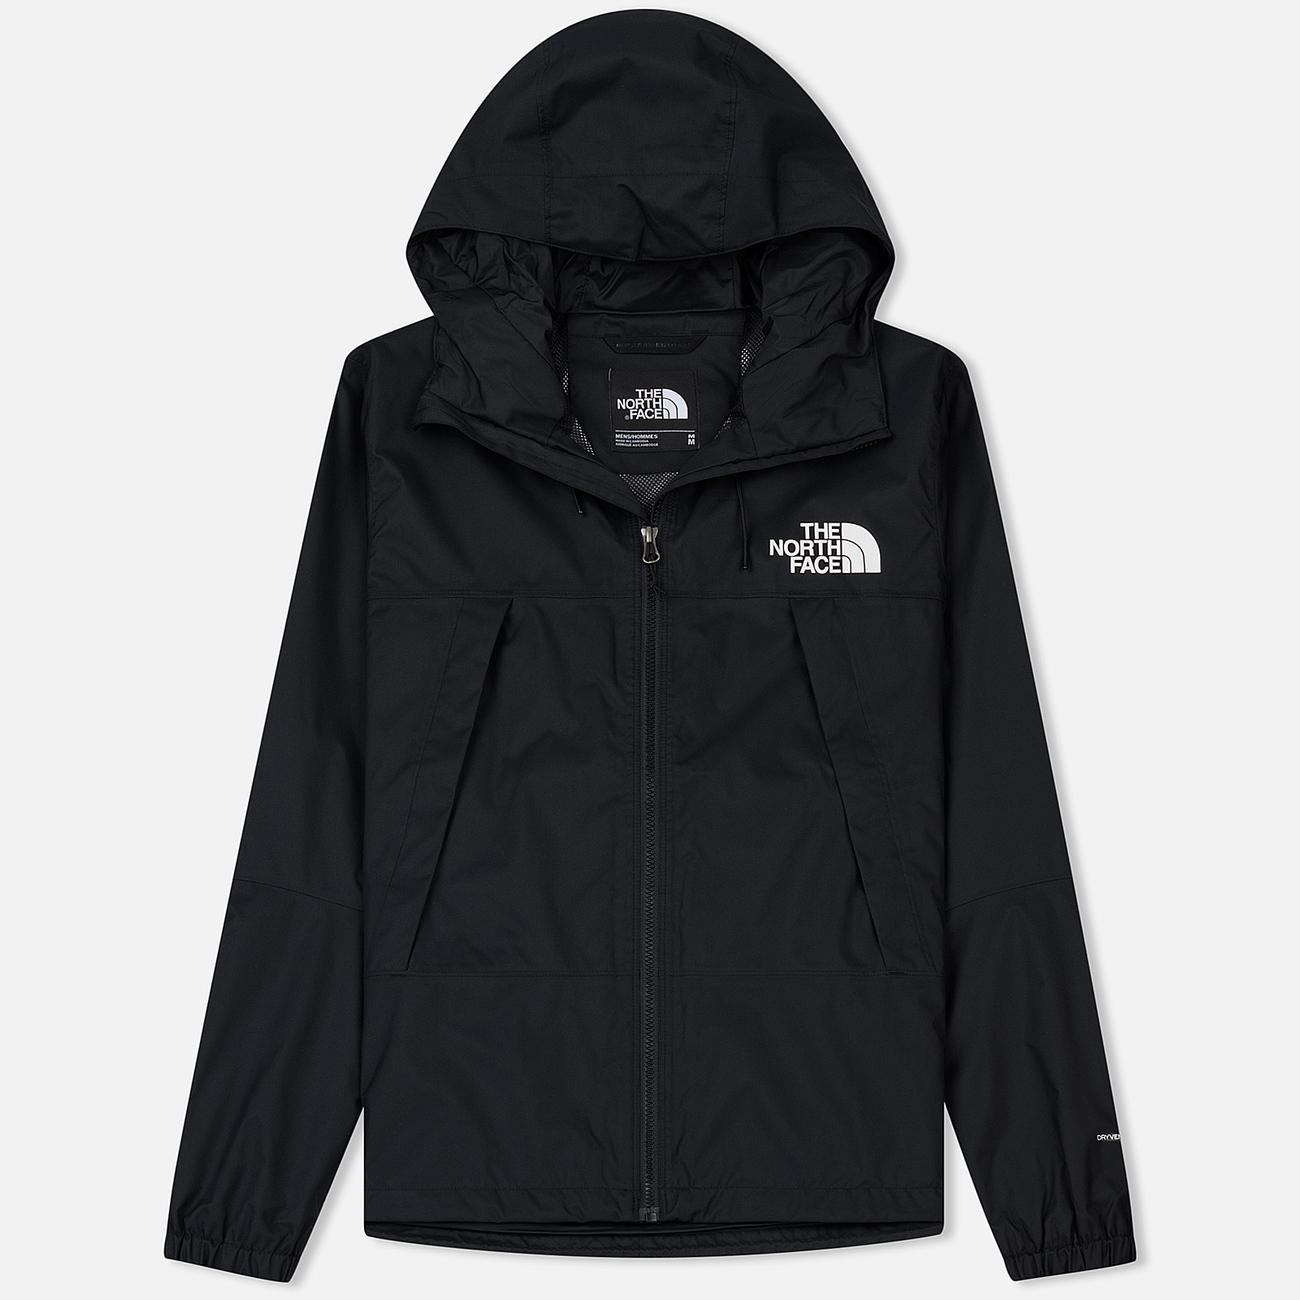 Мужская куртка ветровка The North Face 1990 Mountain Quest TNF Black/TNF White/TNF White